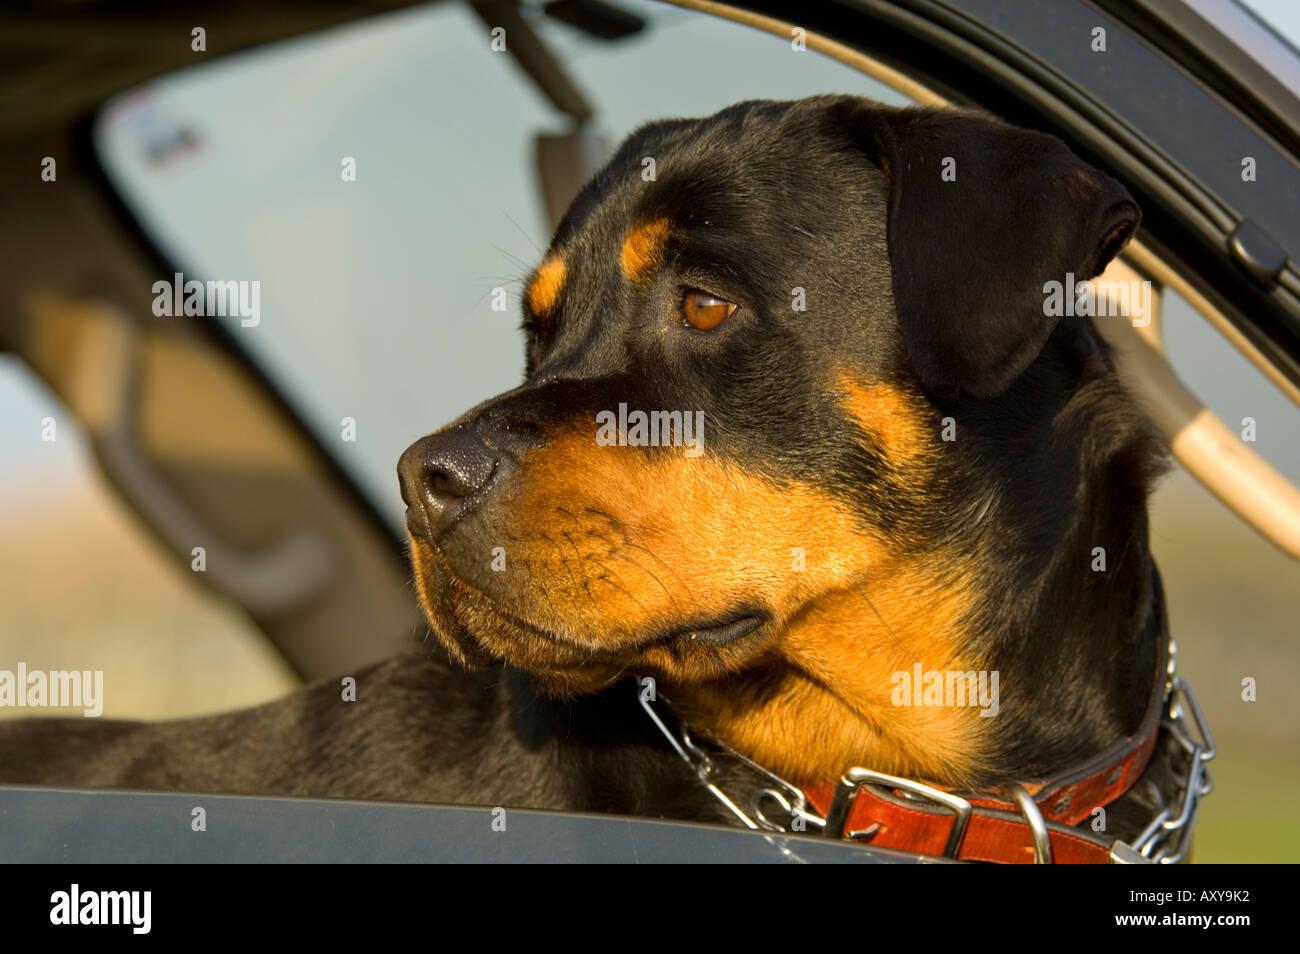 Rottweiler in car window